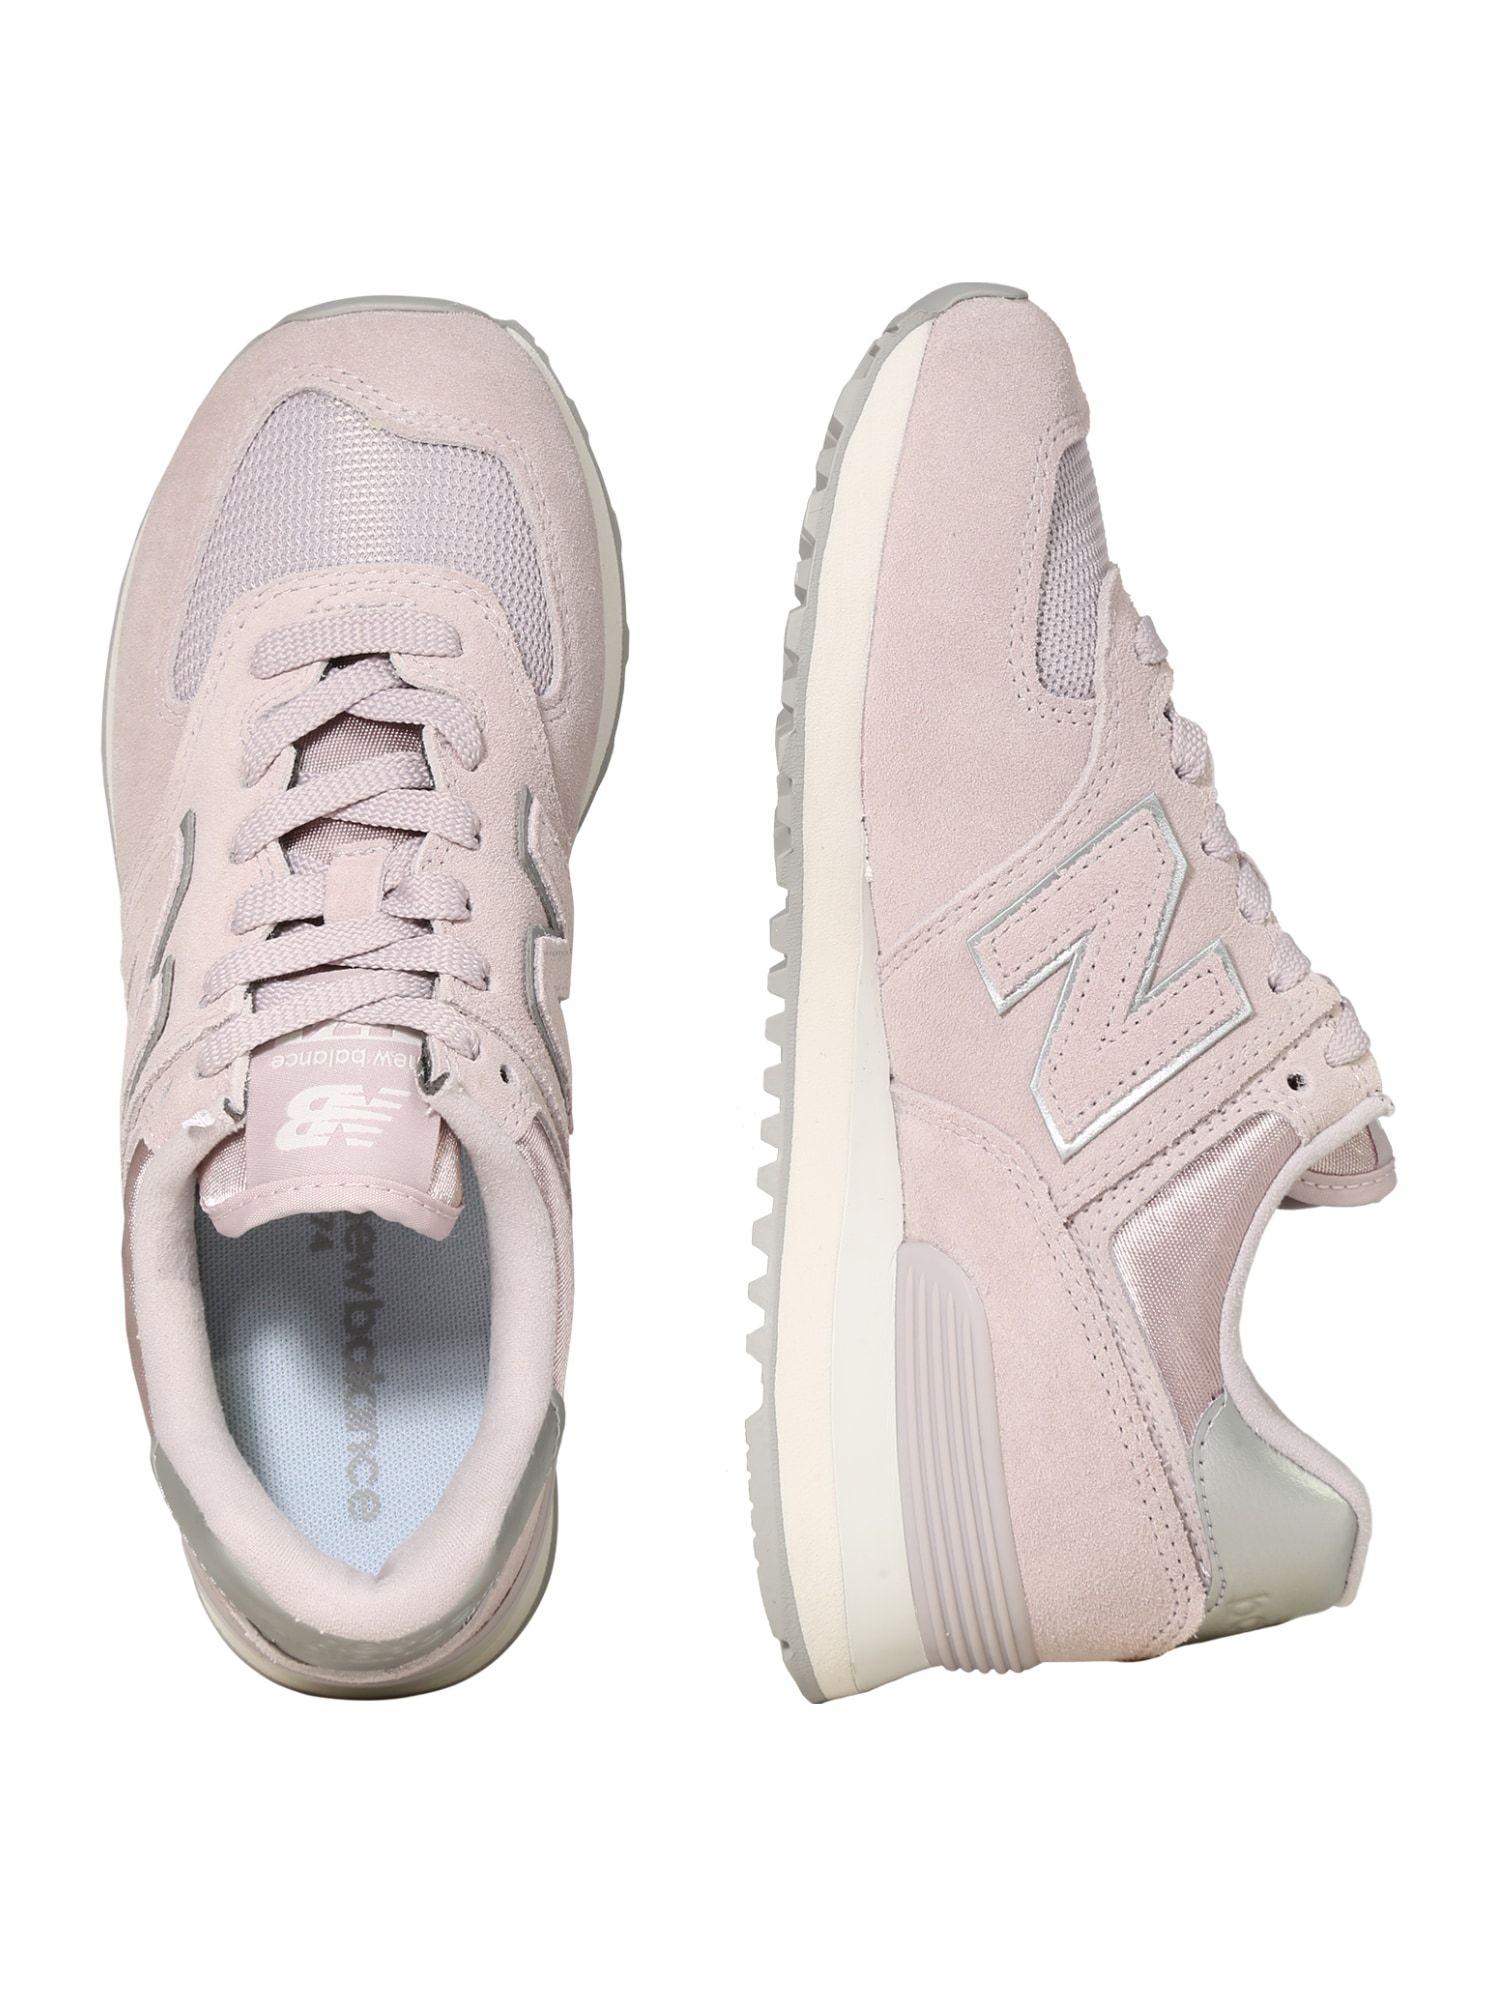 New Balance Sneaker 'WL574' Herren, Beige / Hellgrau / Pink ...